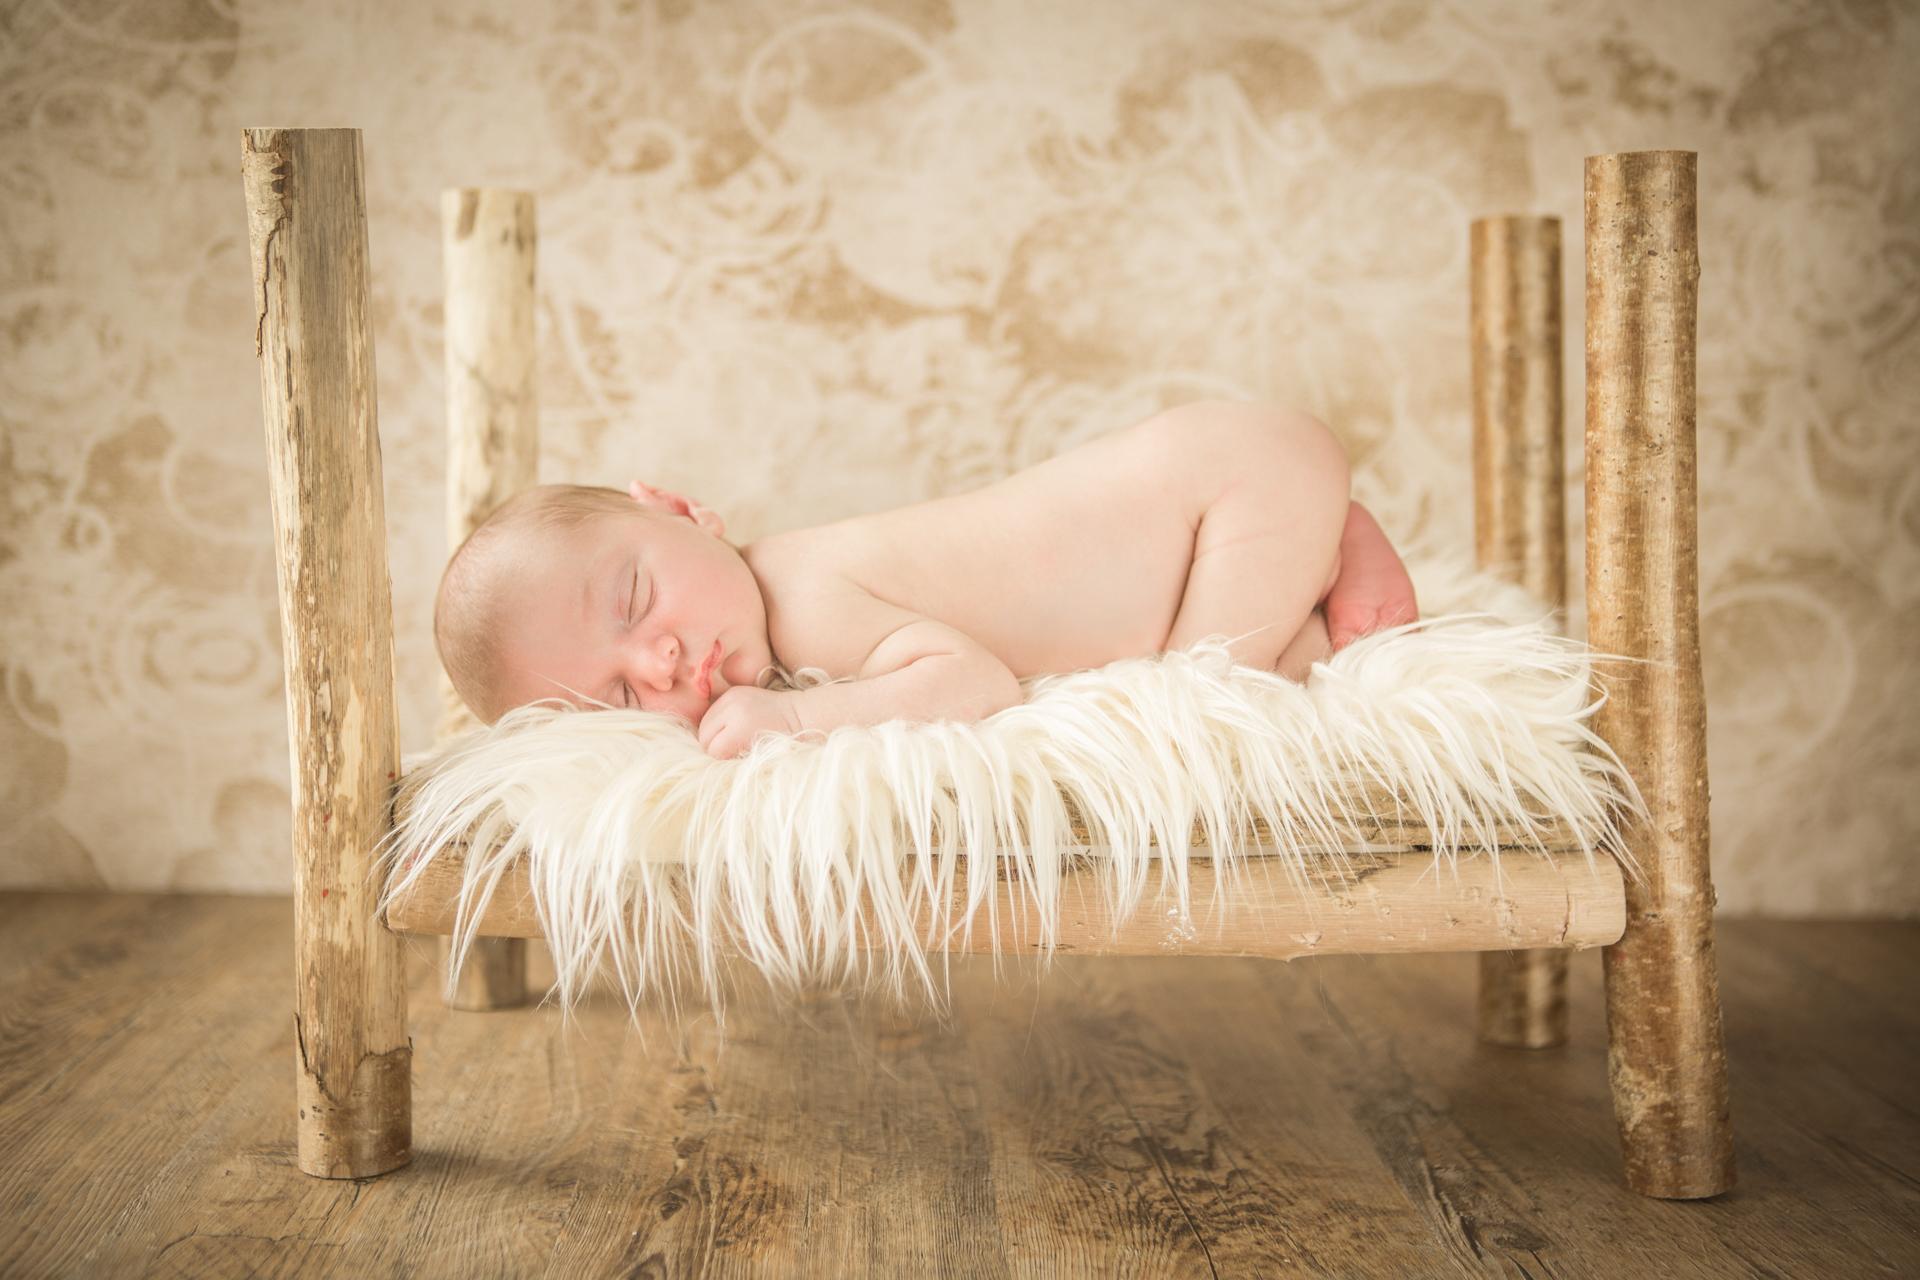 Fotografo de bebés recién nacidos Donostia San Sebastian